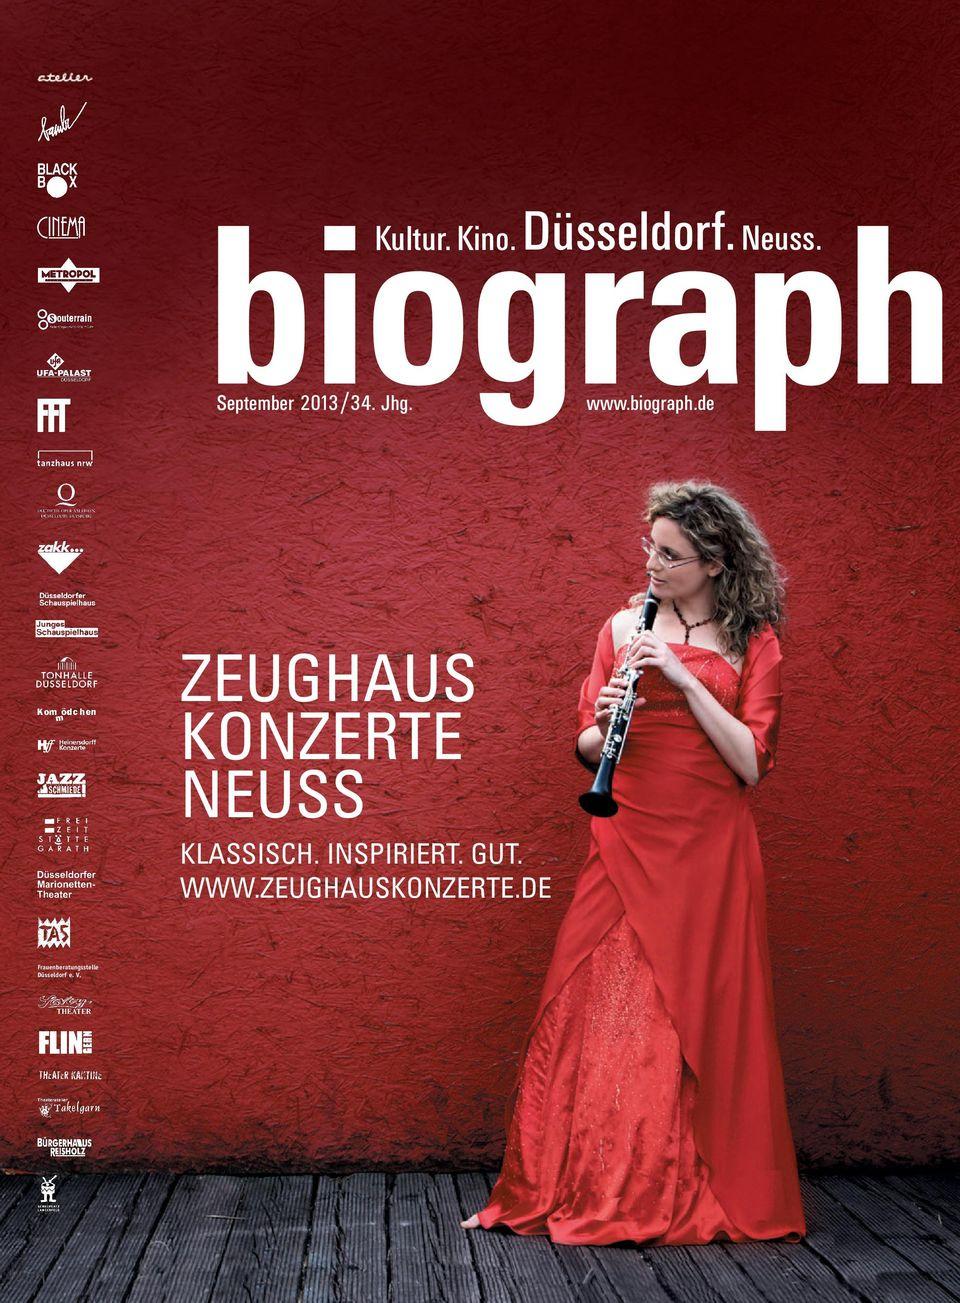 Kultur. Kino. Düsseldorf. Neuss. Zeughaus Konzerte Neuss pour Album Printemps Gs